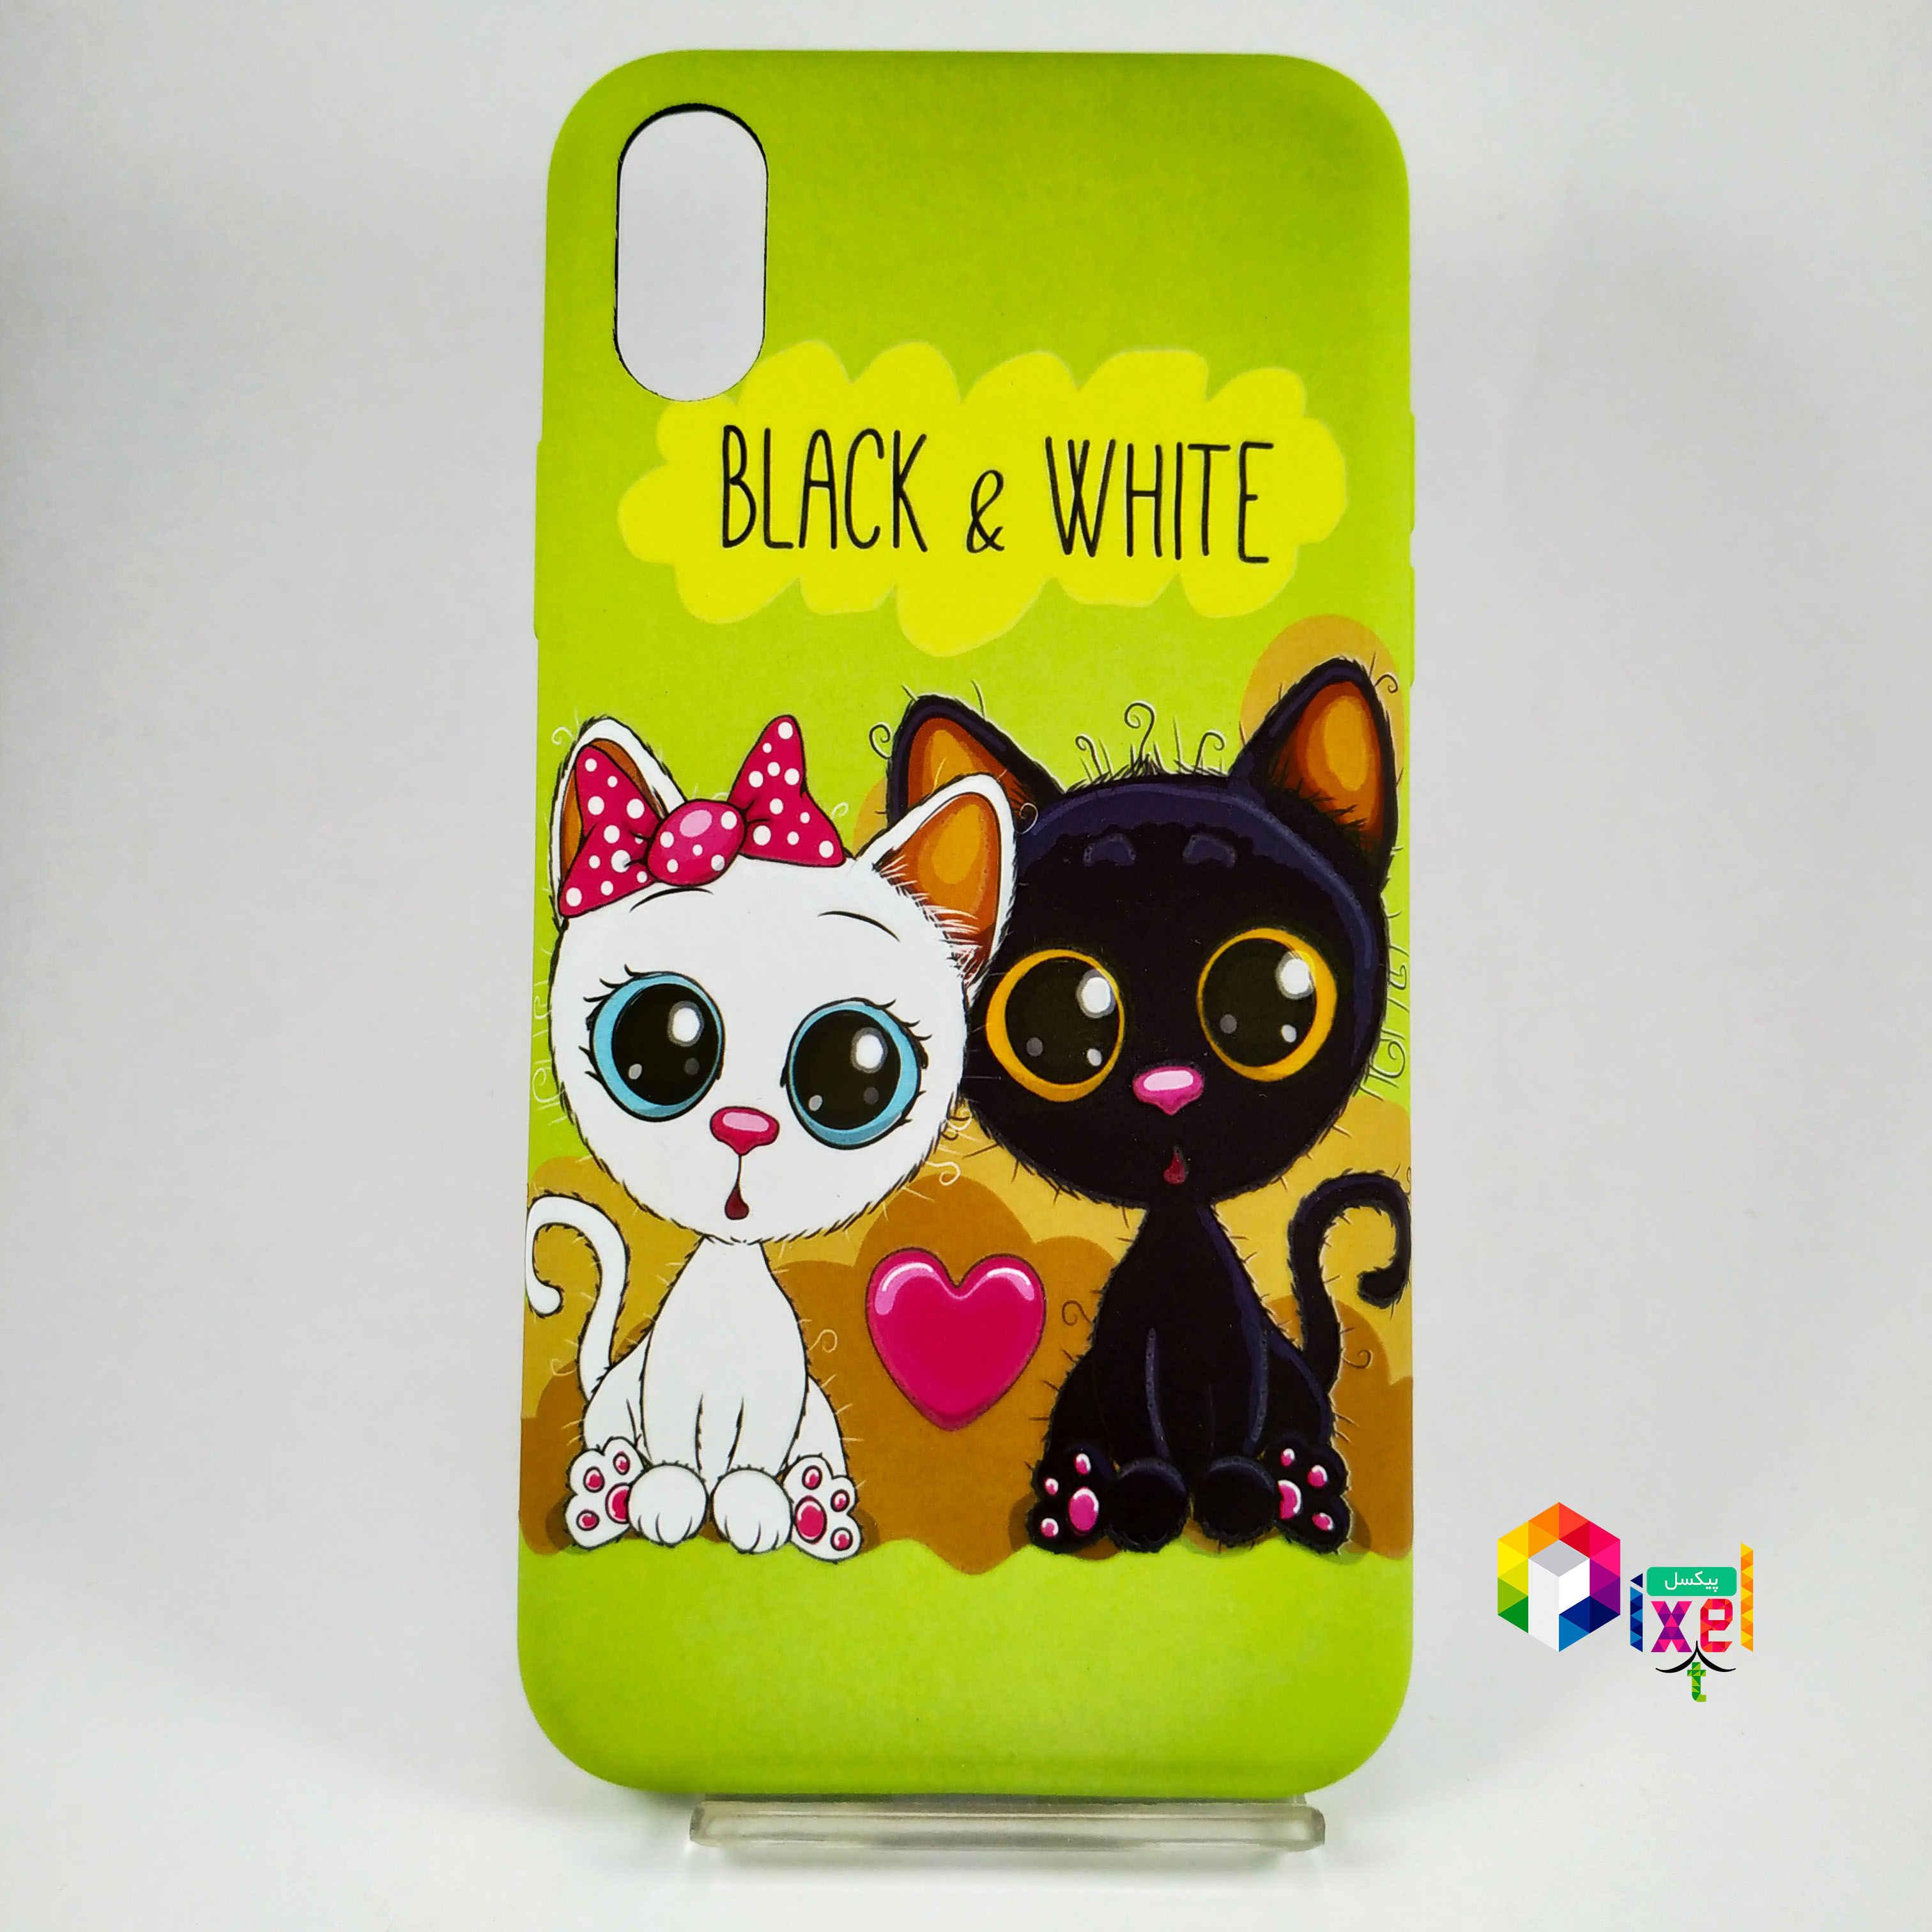 قاب فانتزی گربه ای iPhone X , iPhone XS